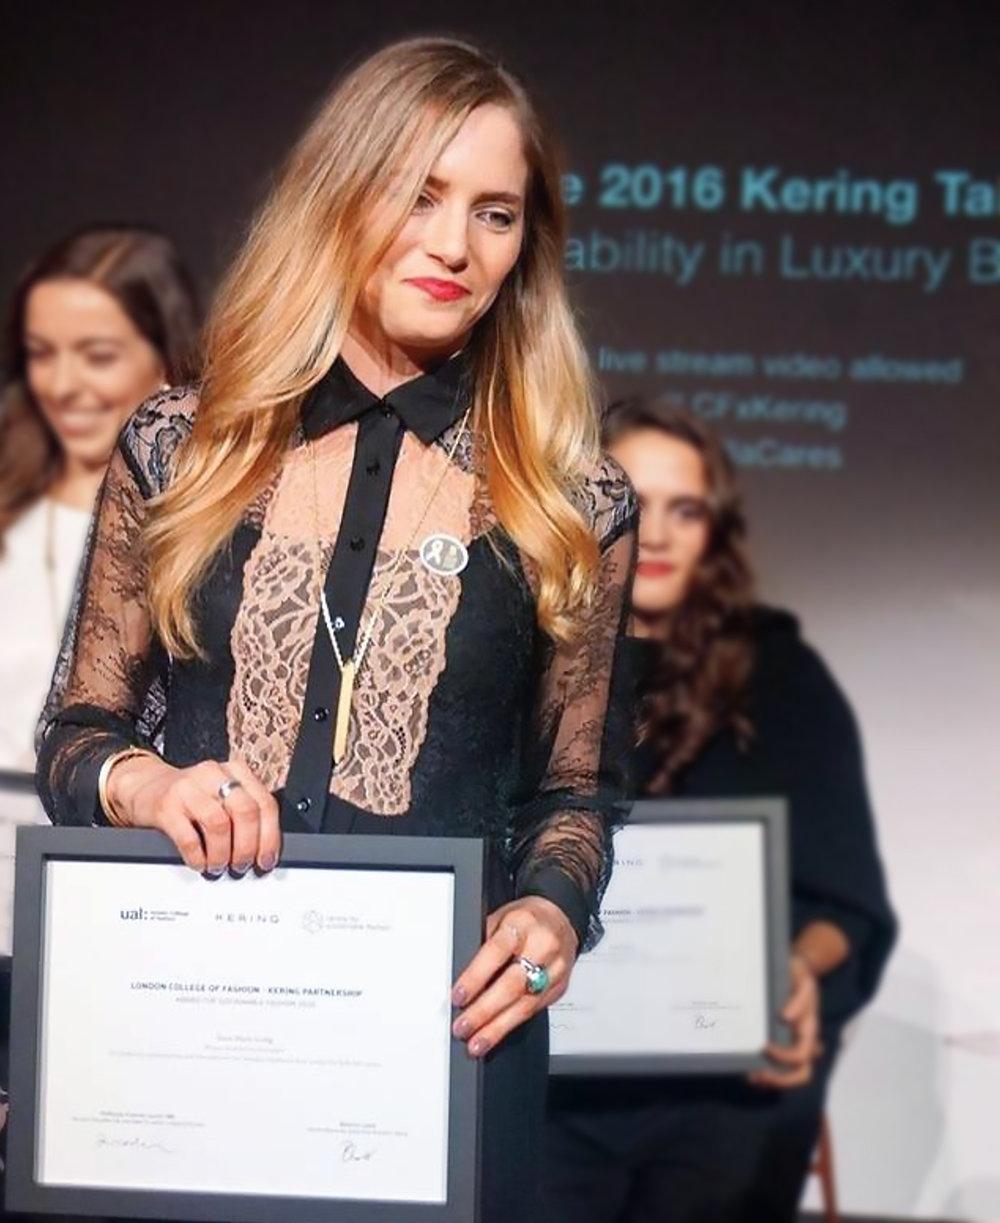 02 Awards - Winner of–2016 Kering Award for Sustainable Fashion Innovation, 2016 UAL Commercial Impact Award,2017 Plug and Play Fashion for Good Accelerator.Finalist of–2017 Mayor of London Entrepreneur Award,2017 Global Change Award.